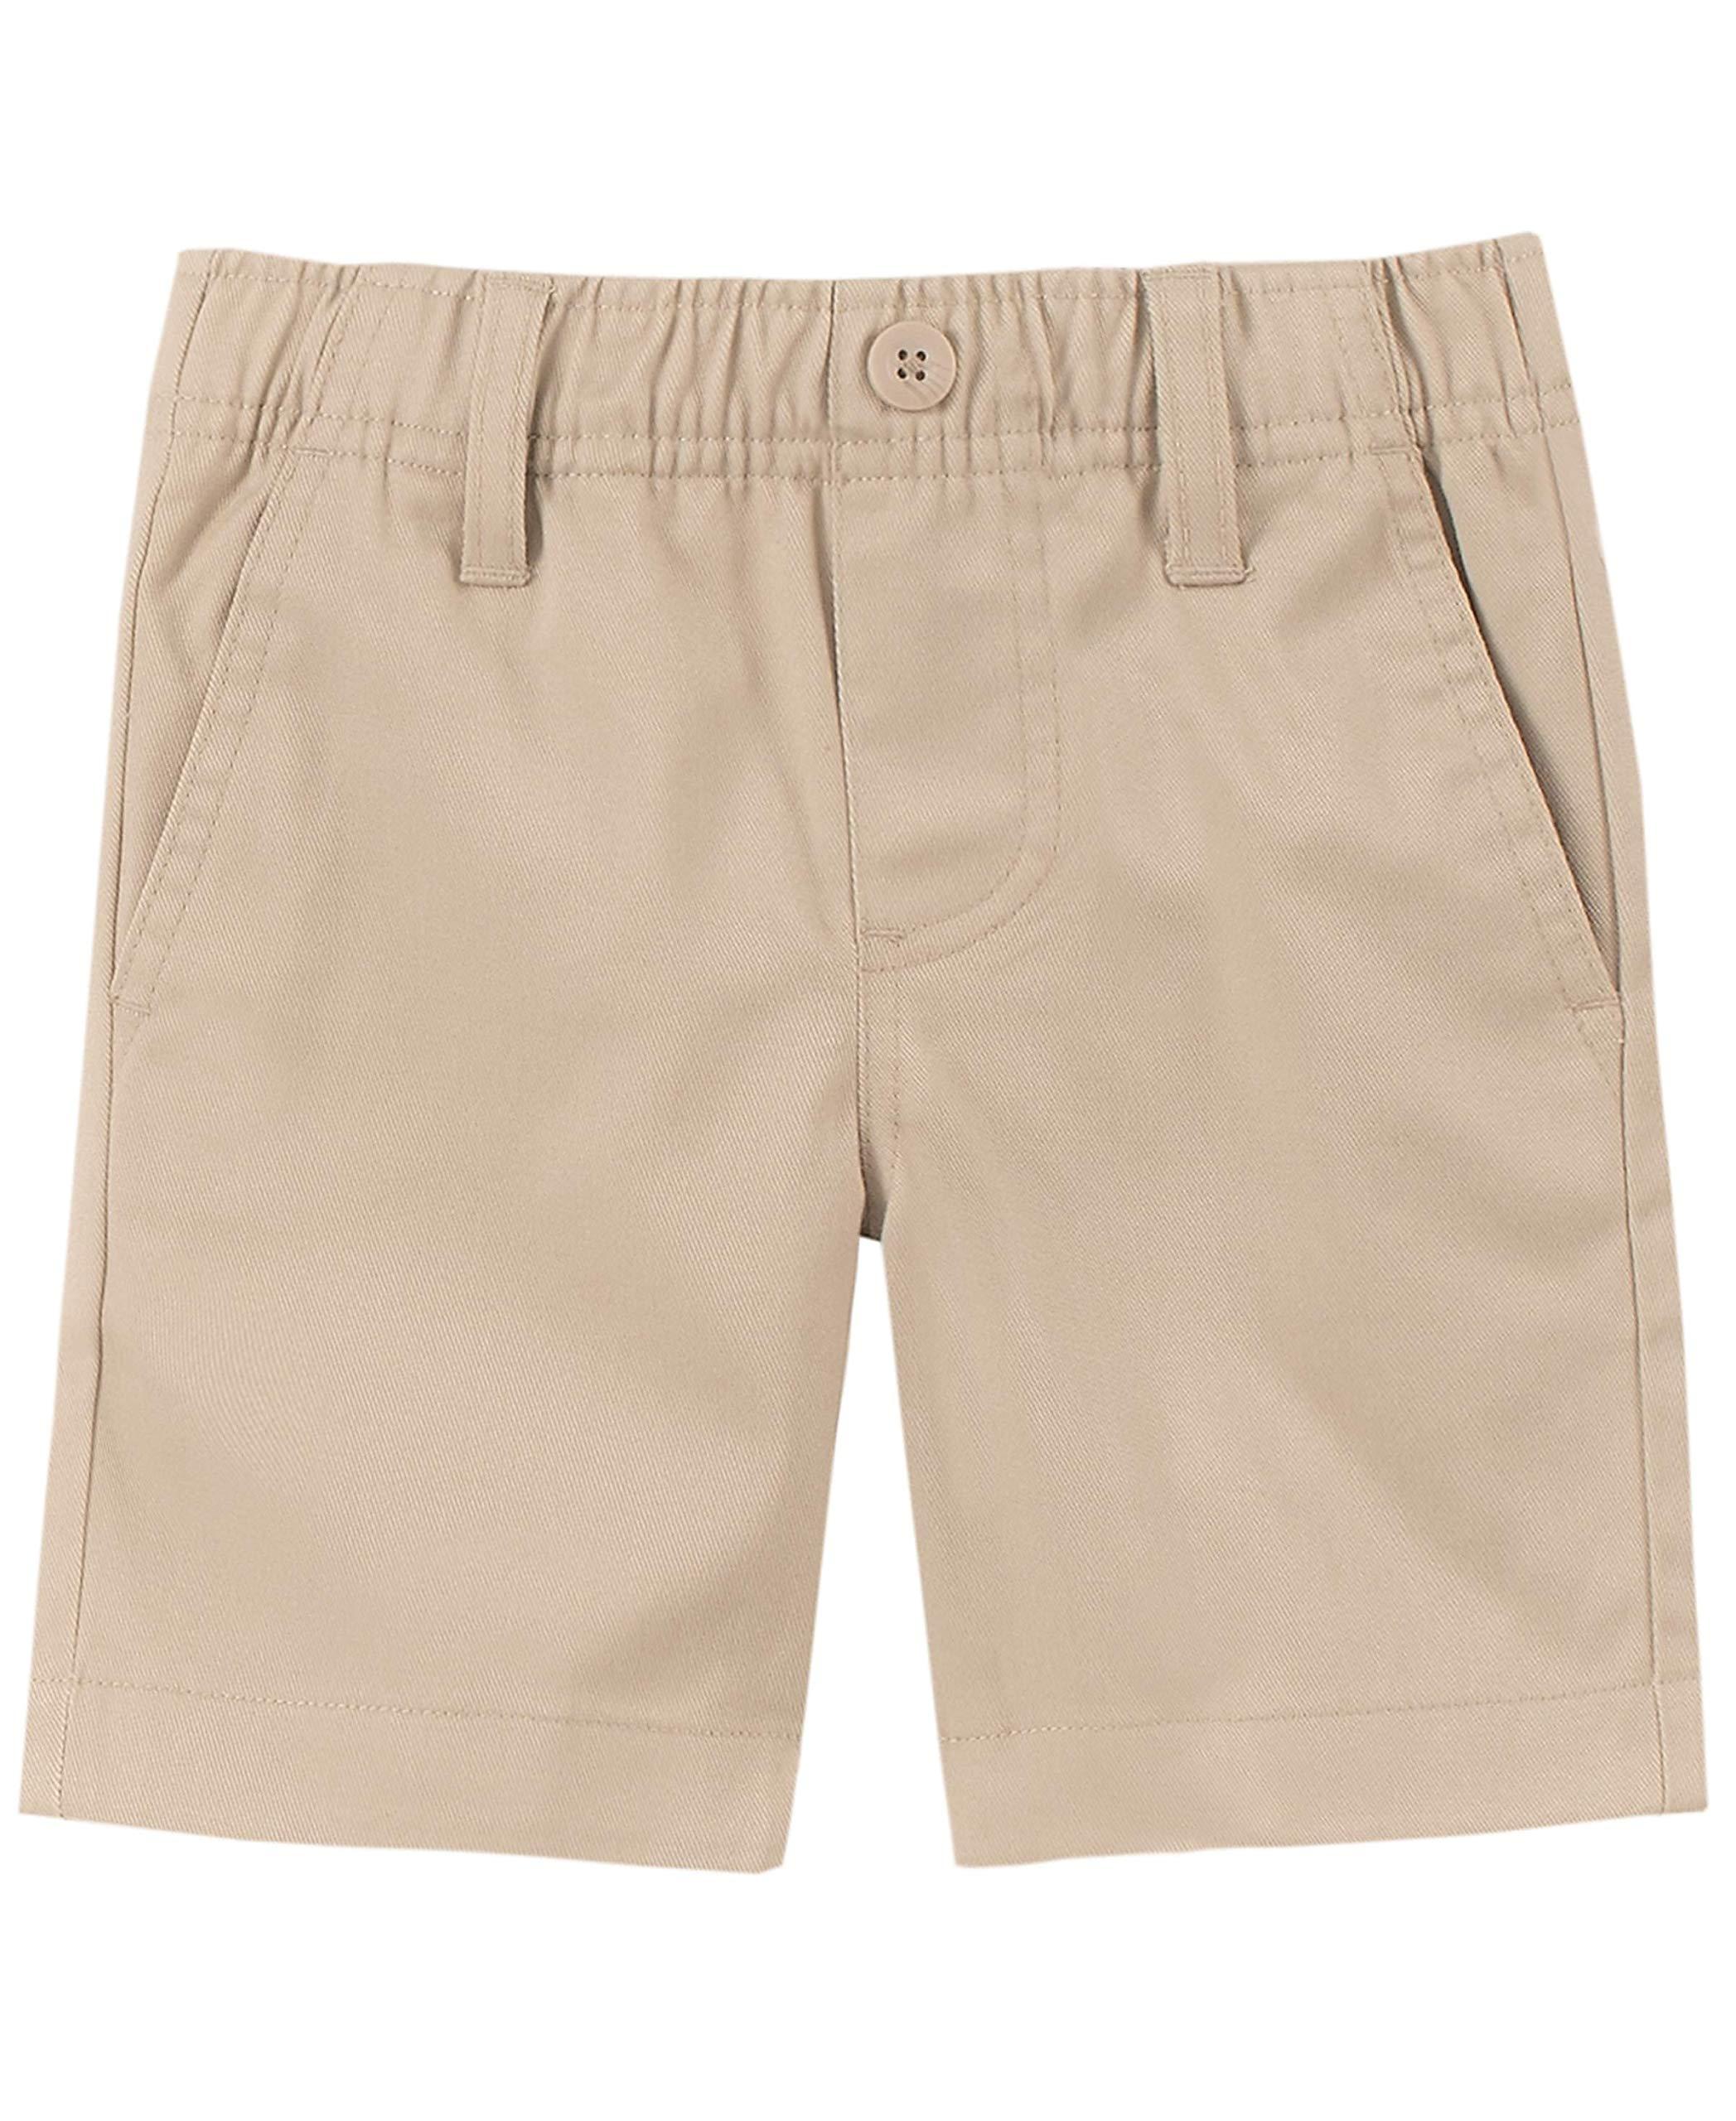 Nautica Boys' Toddler School Uniform Flat Front Twill Short, Khaki/Pull-on, 4T by Nautica